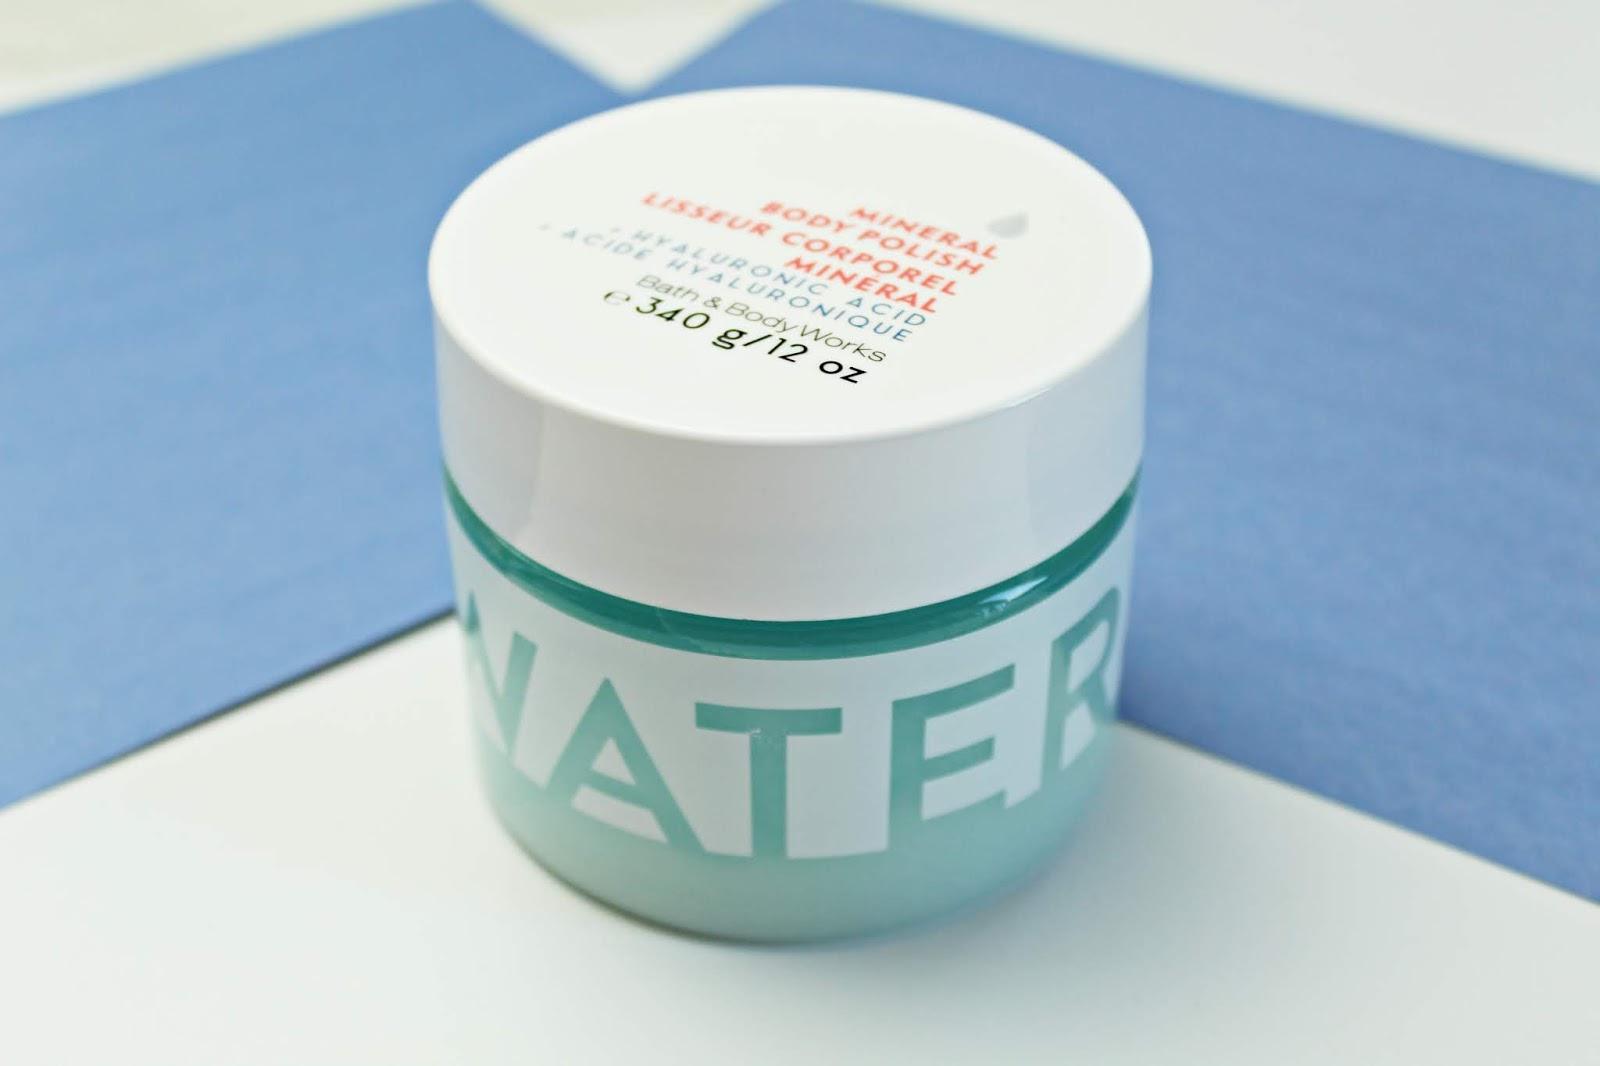 WATER Hyaluronic Acid Mineral Body Polish bath&body works